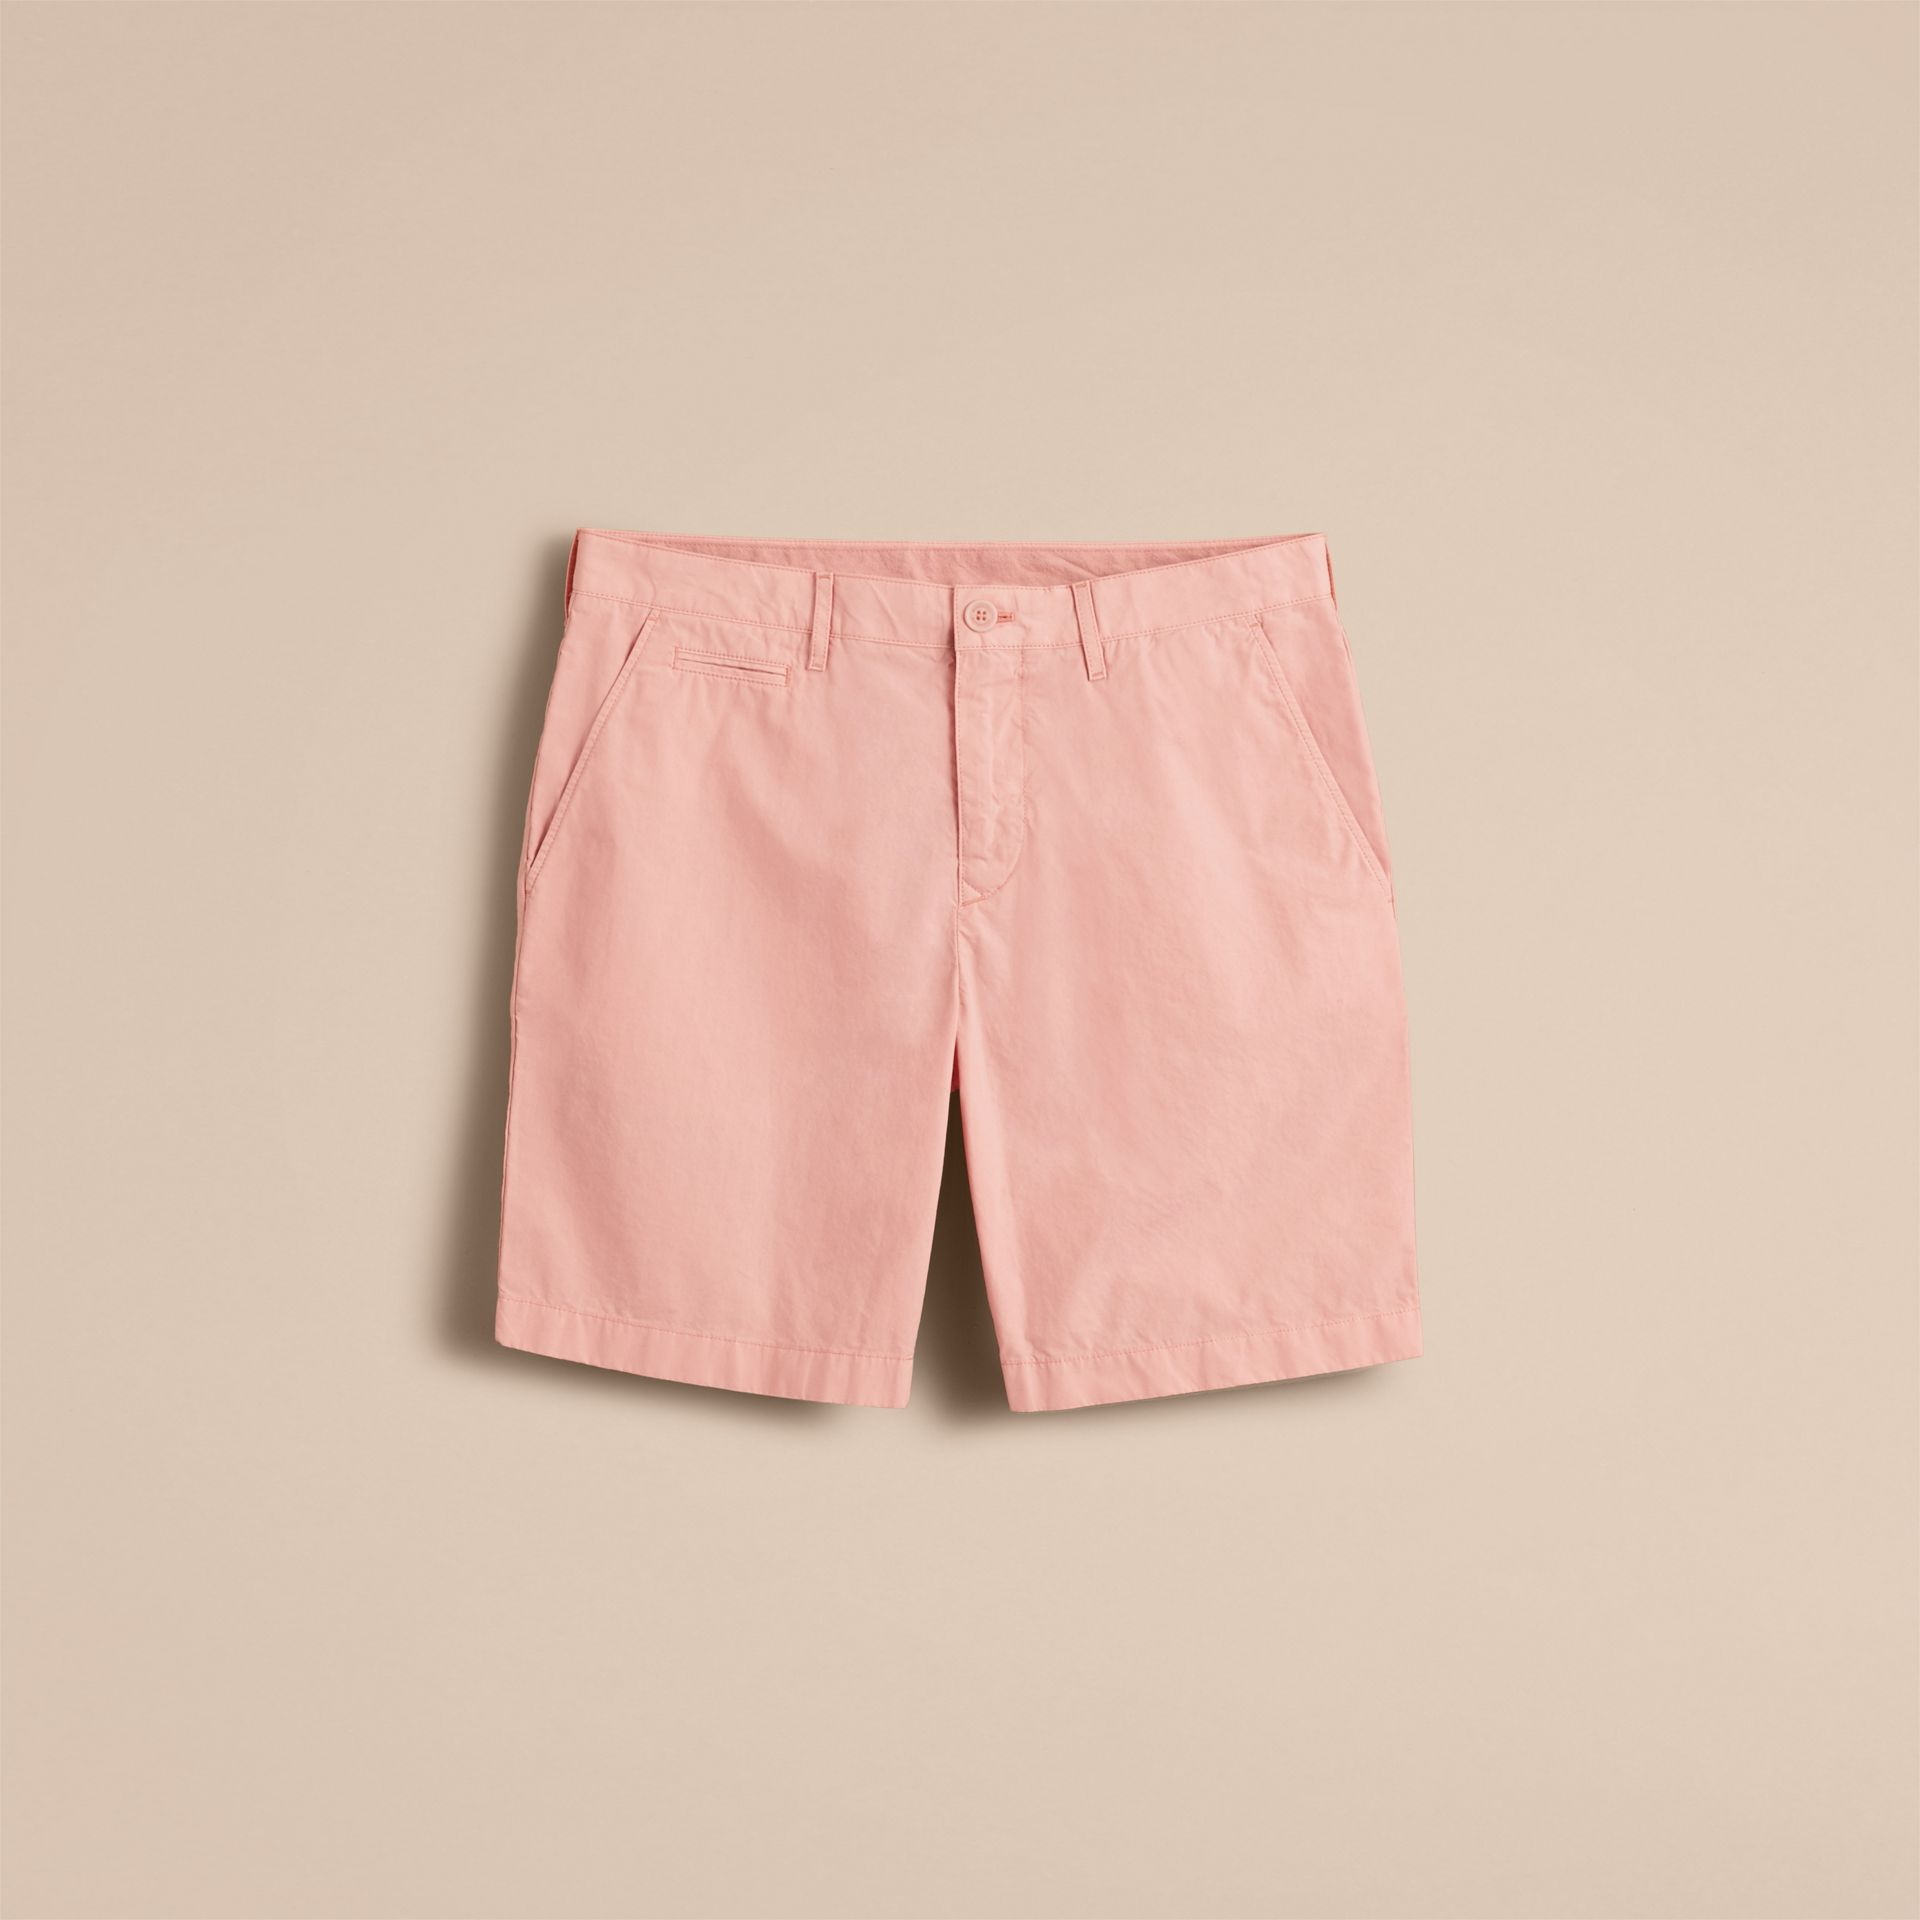 Cotton Poplin Chino Shorts Apricot Pink - gallery image 4